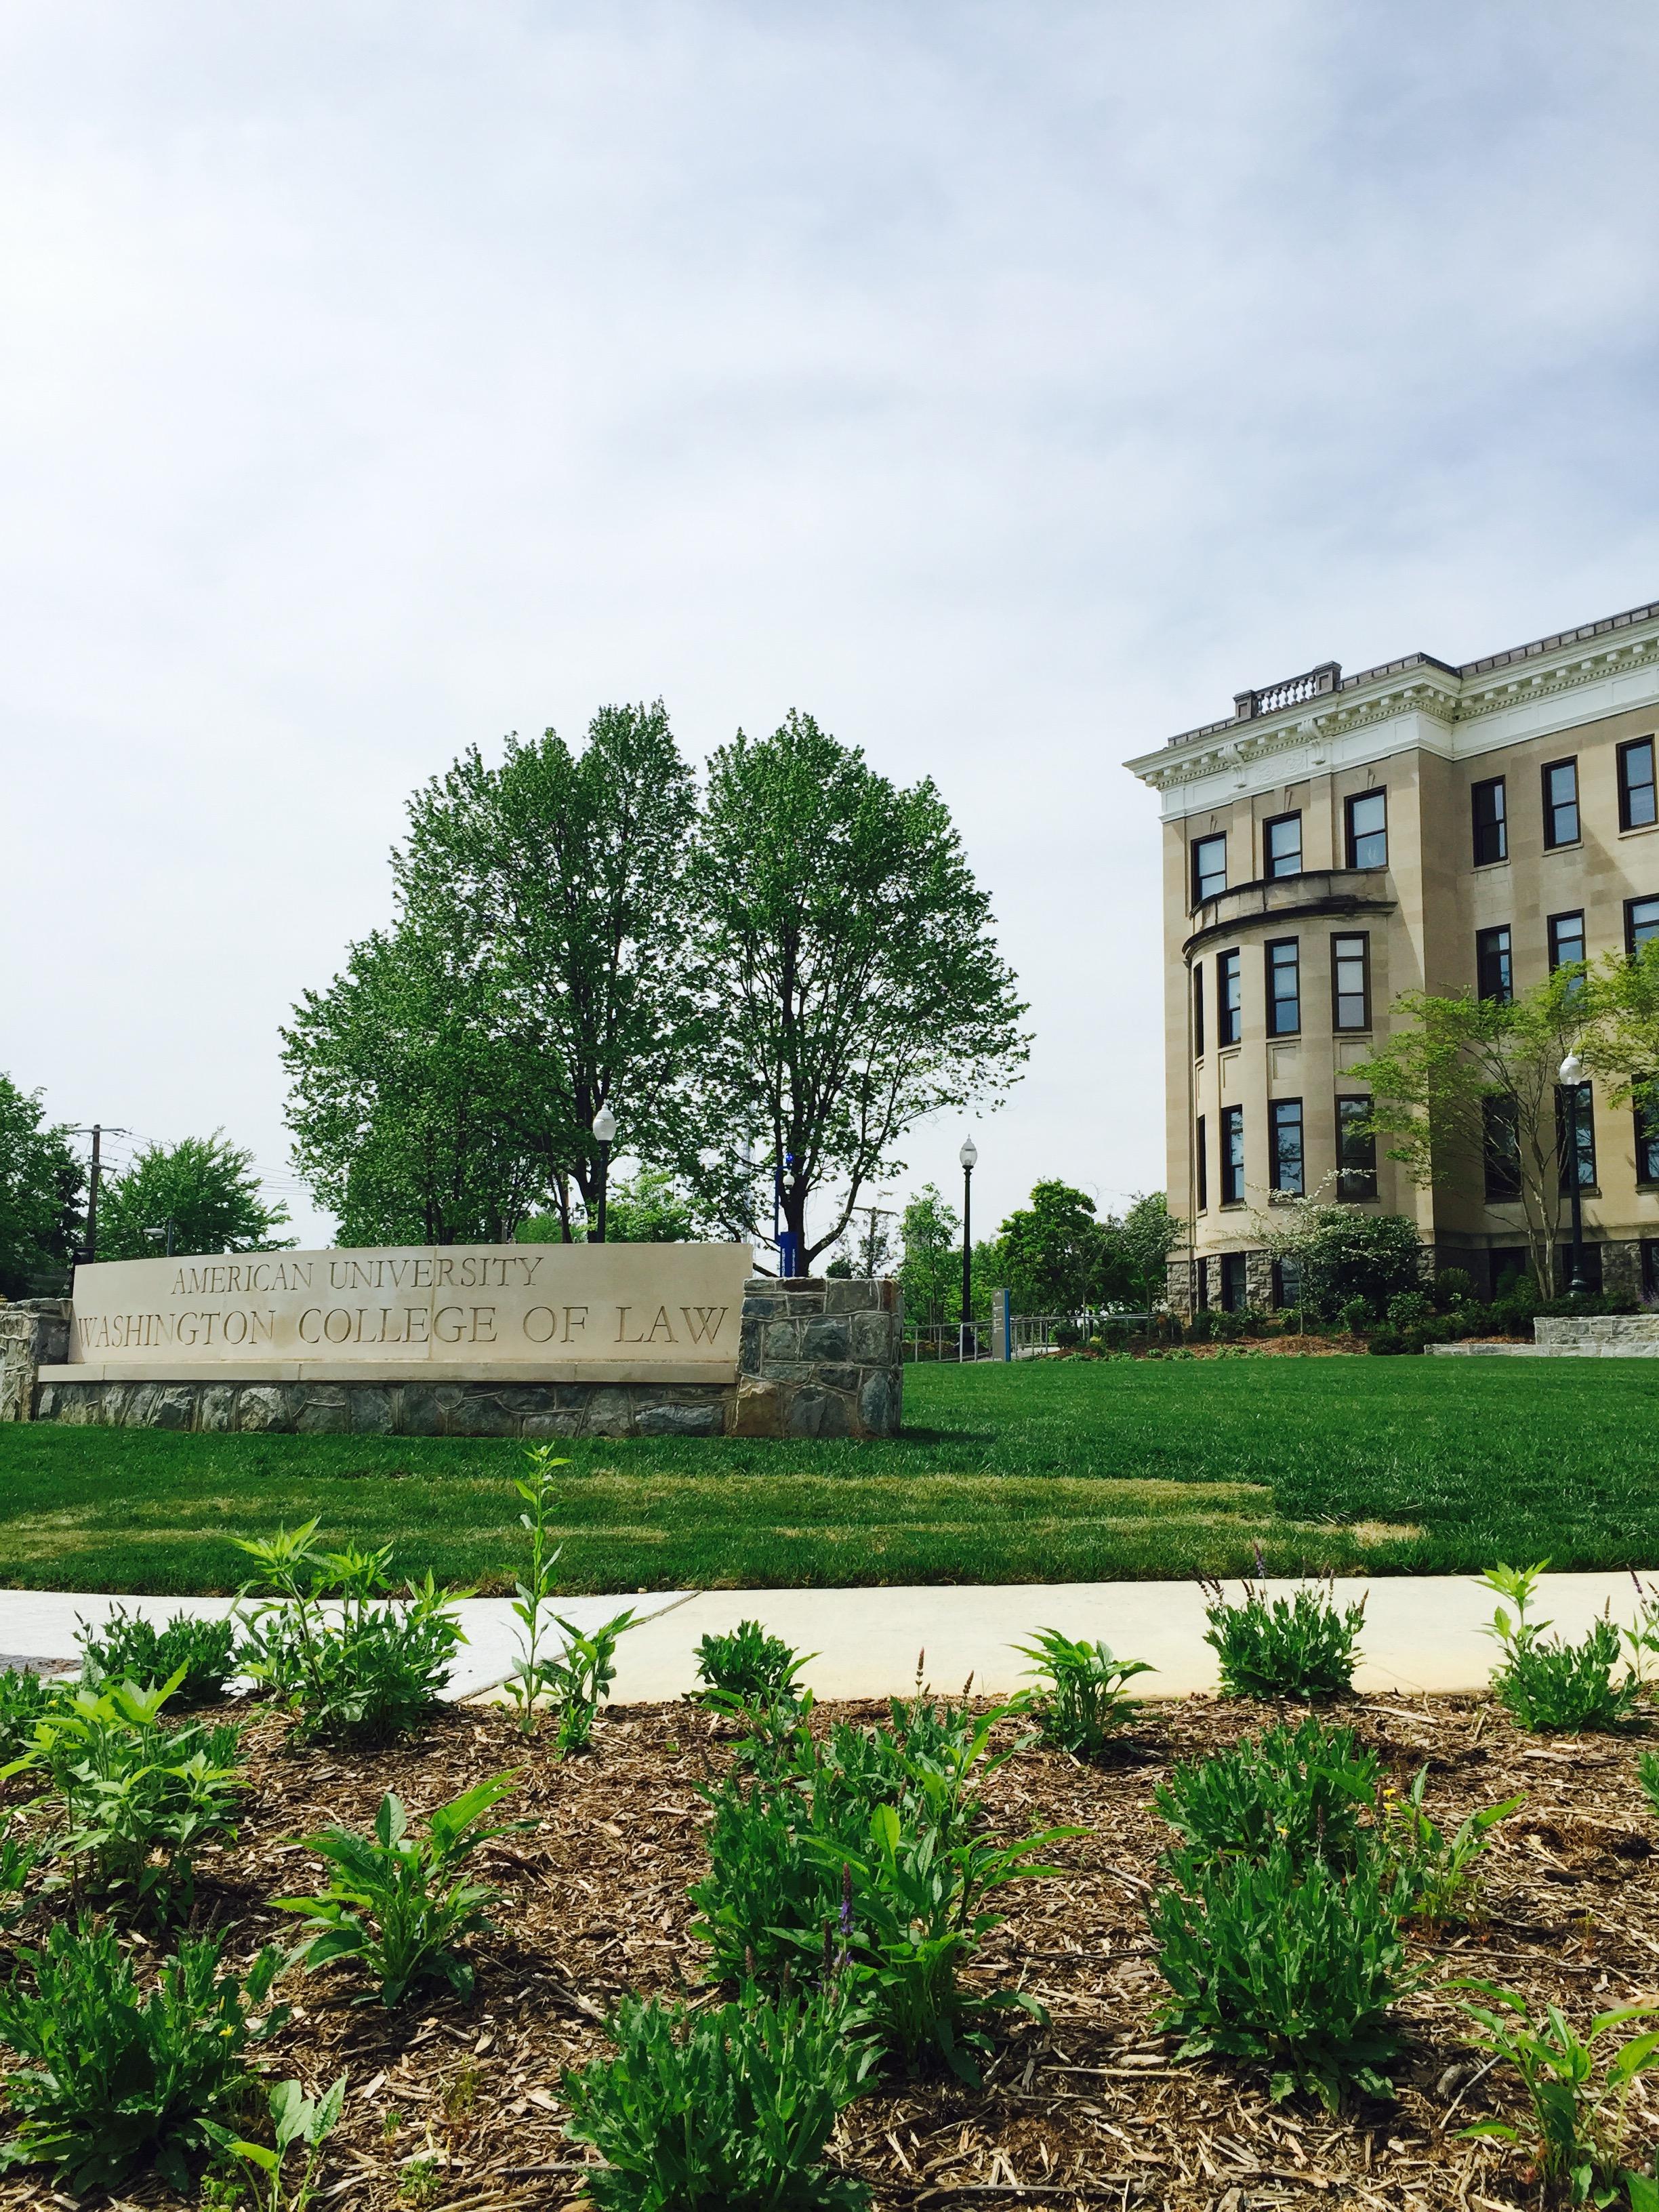 American University 1